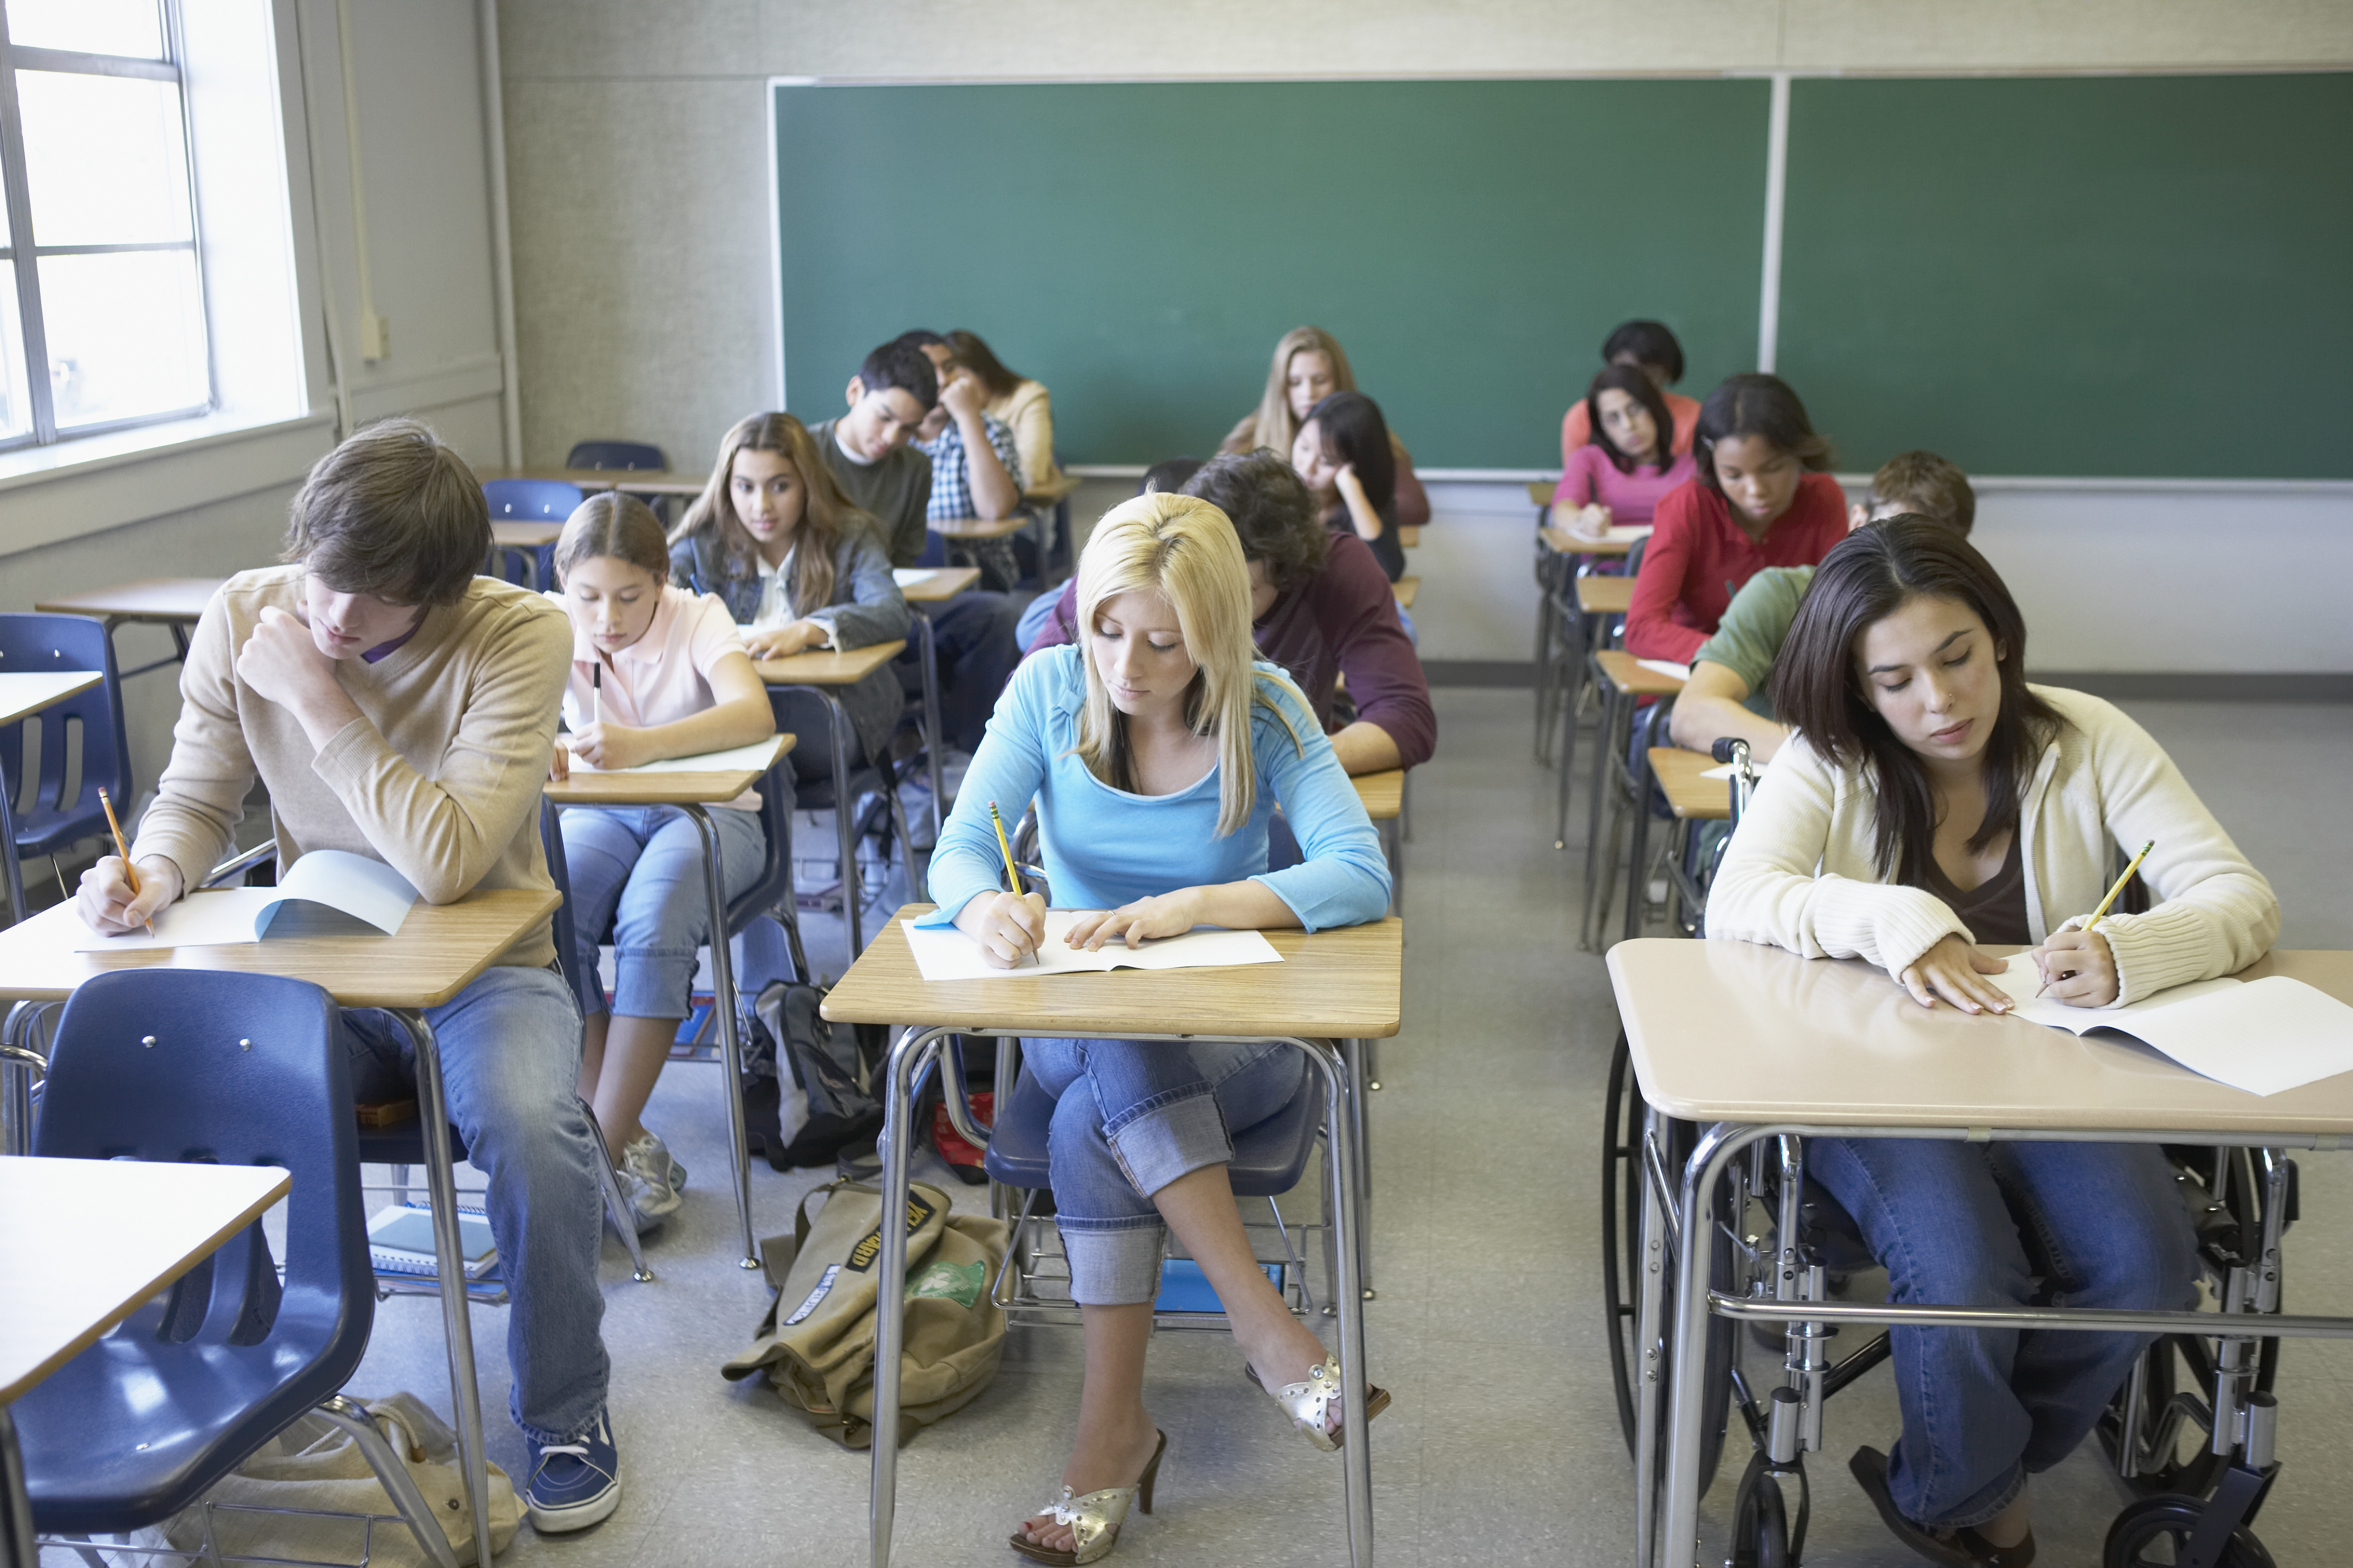 Teen squirt in class site